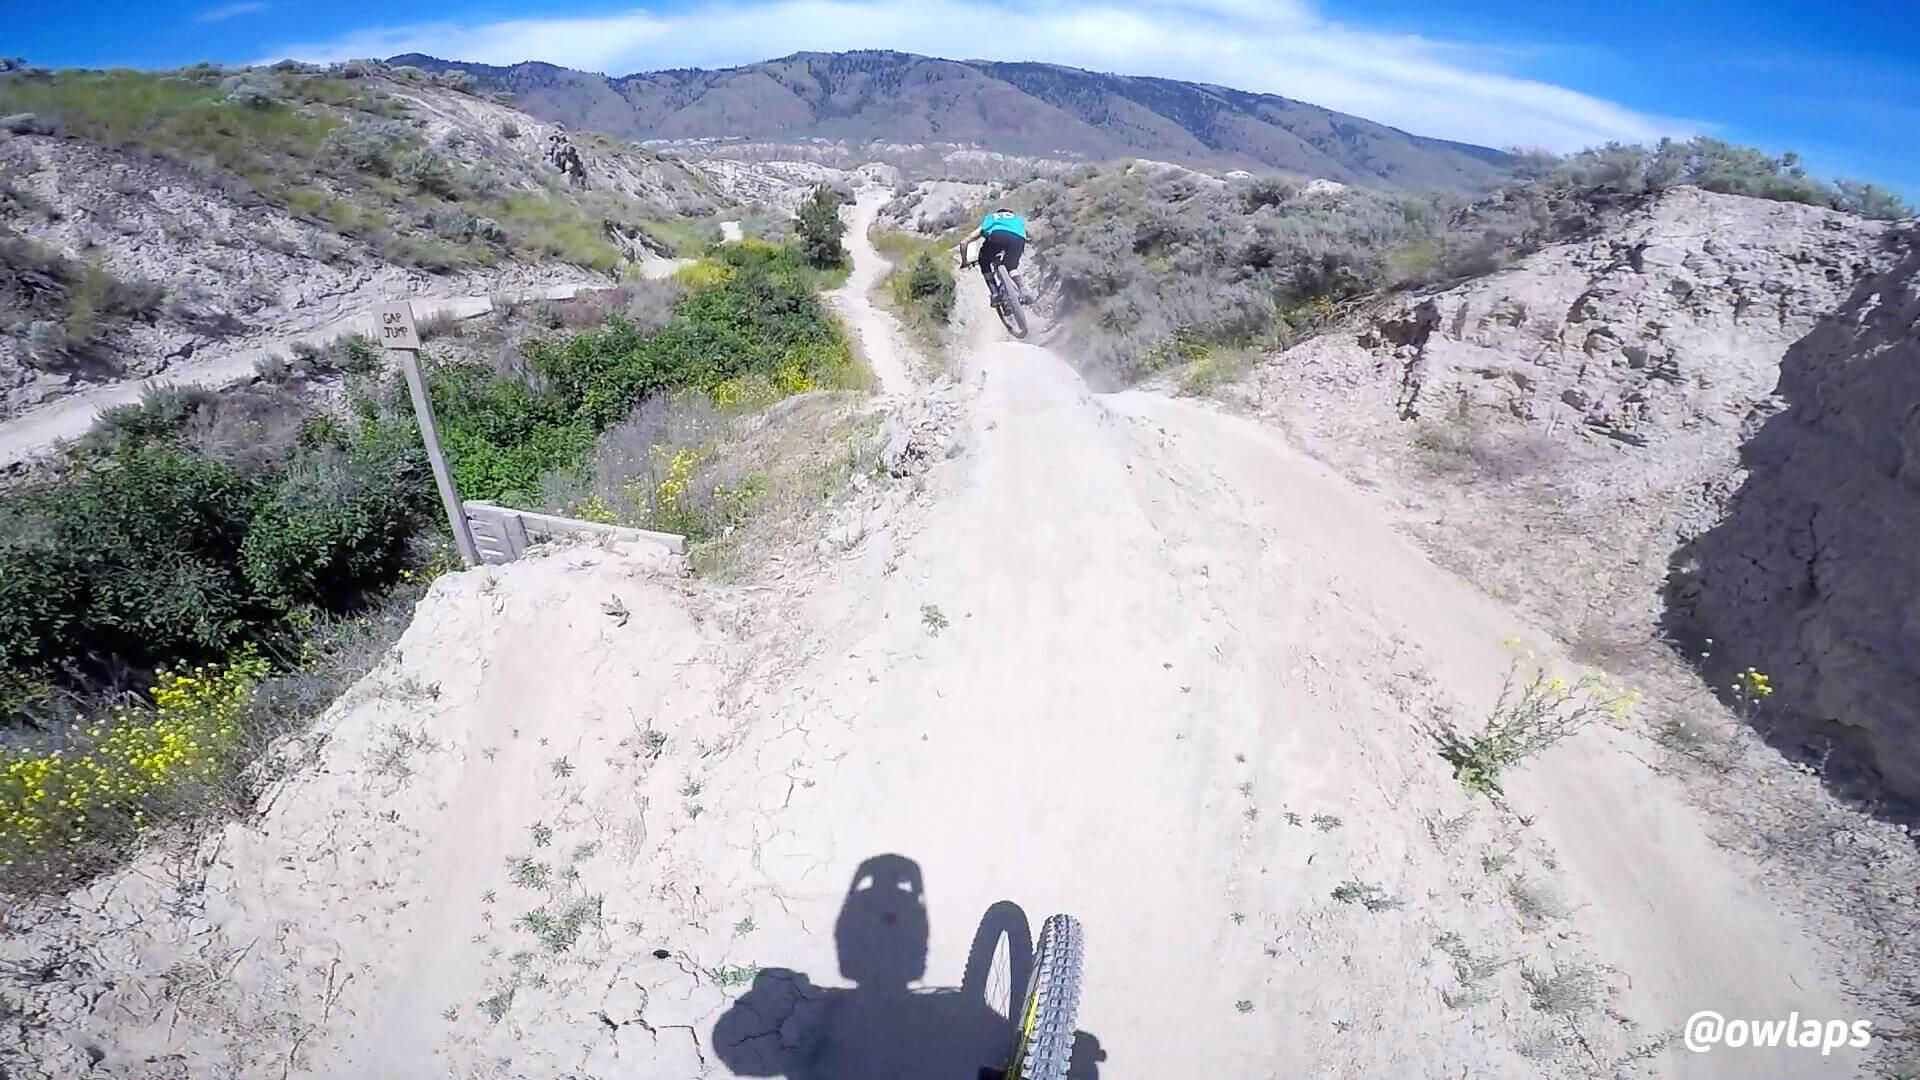 wrangler-kamloops-bike-ranch-canada-owlaps-HD-14